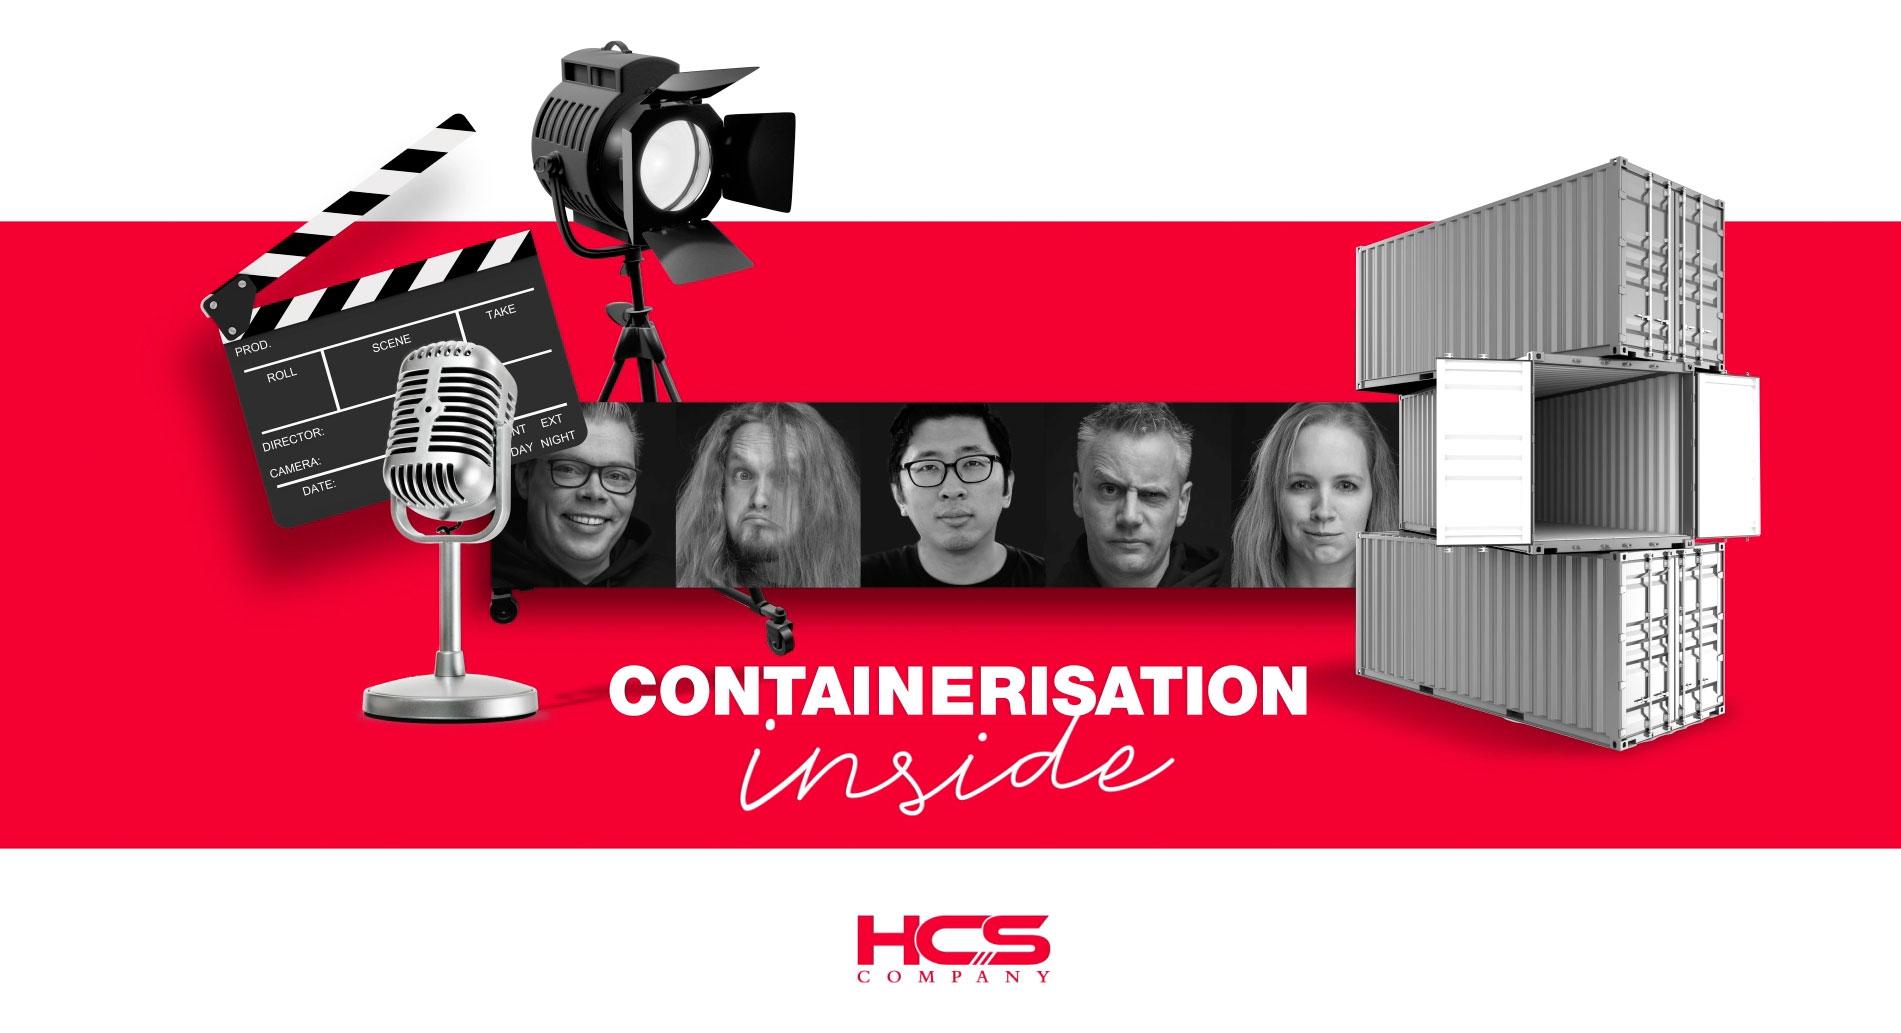 Containerisation-inside-12-mei